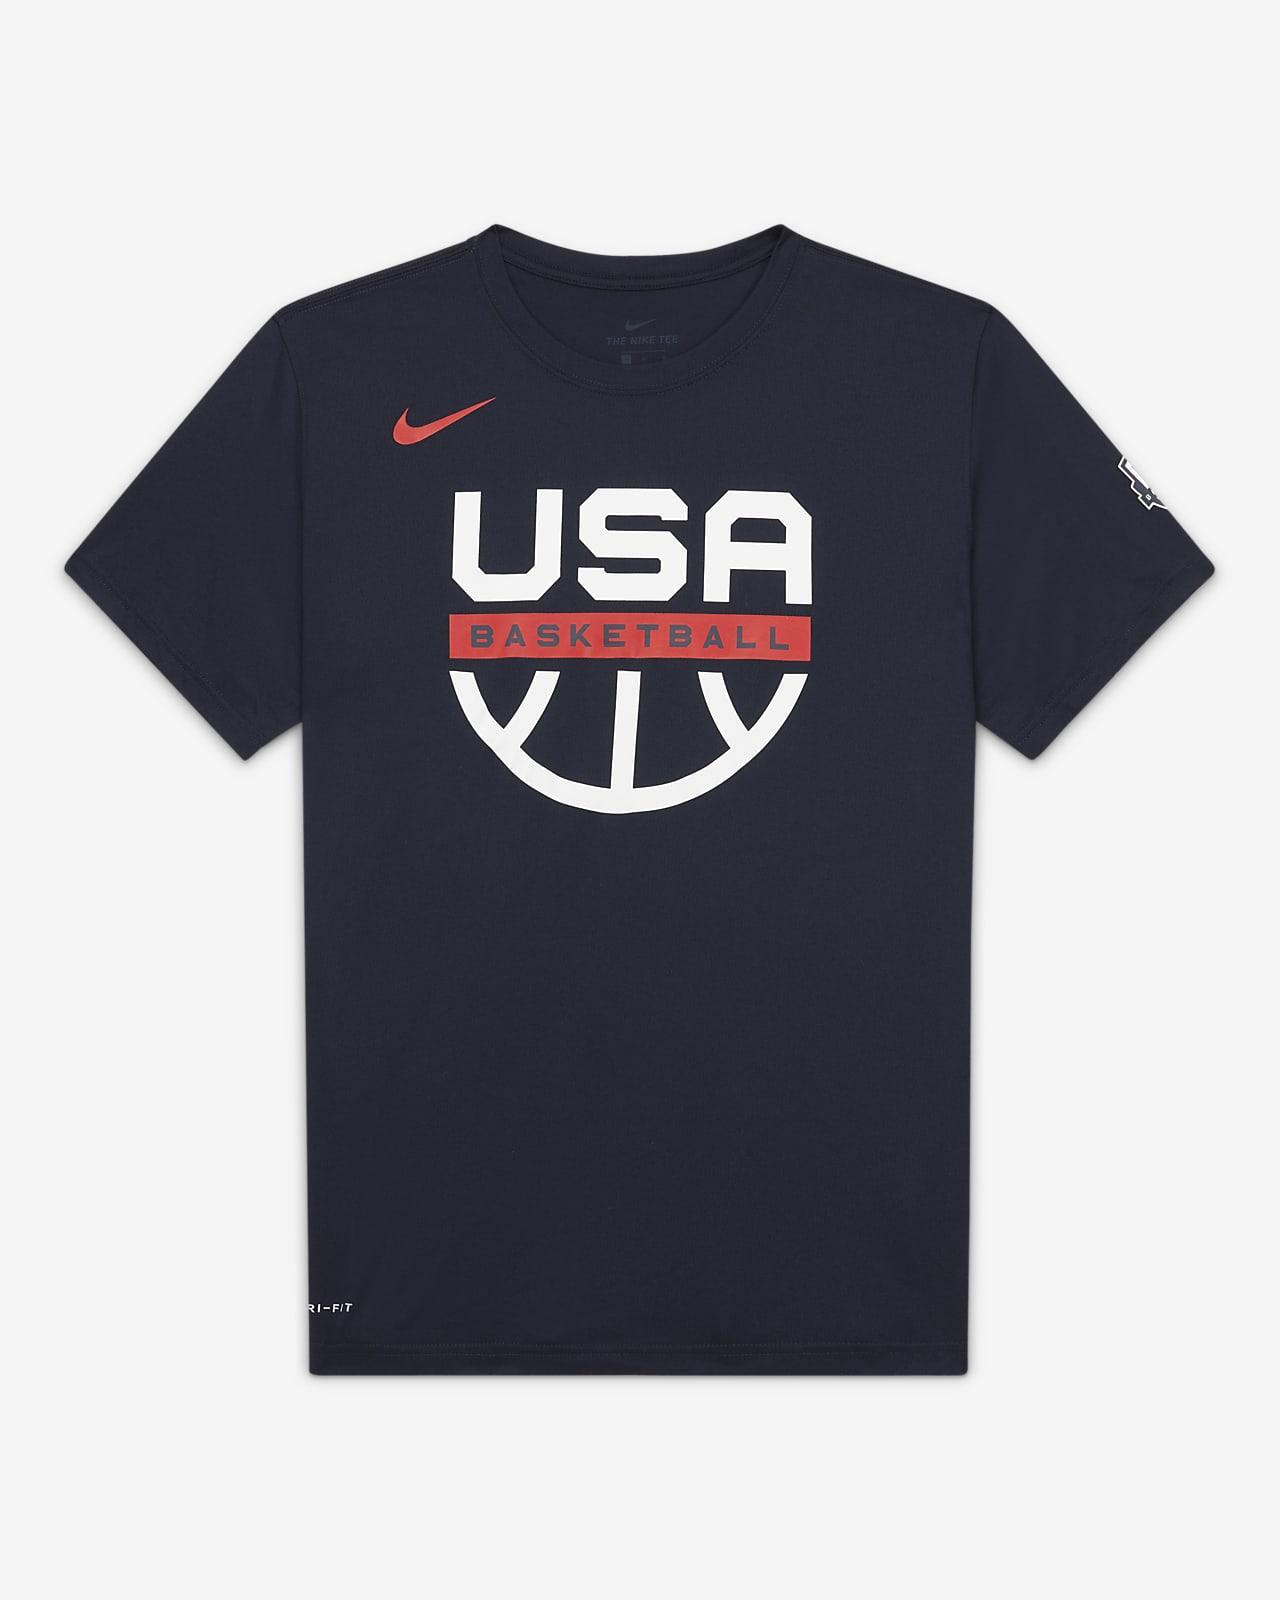 Playera de práctica de básquetbol para hombre USAB Nike Dri-FIT